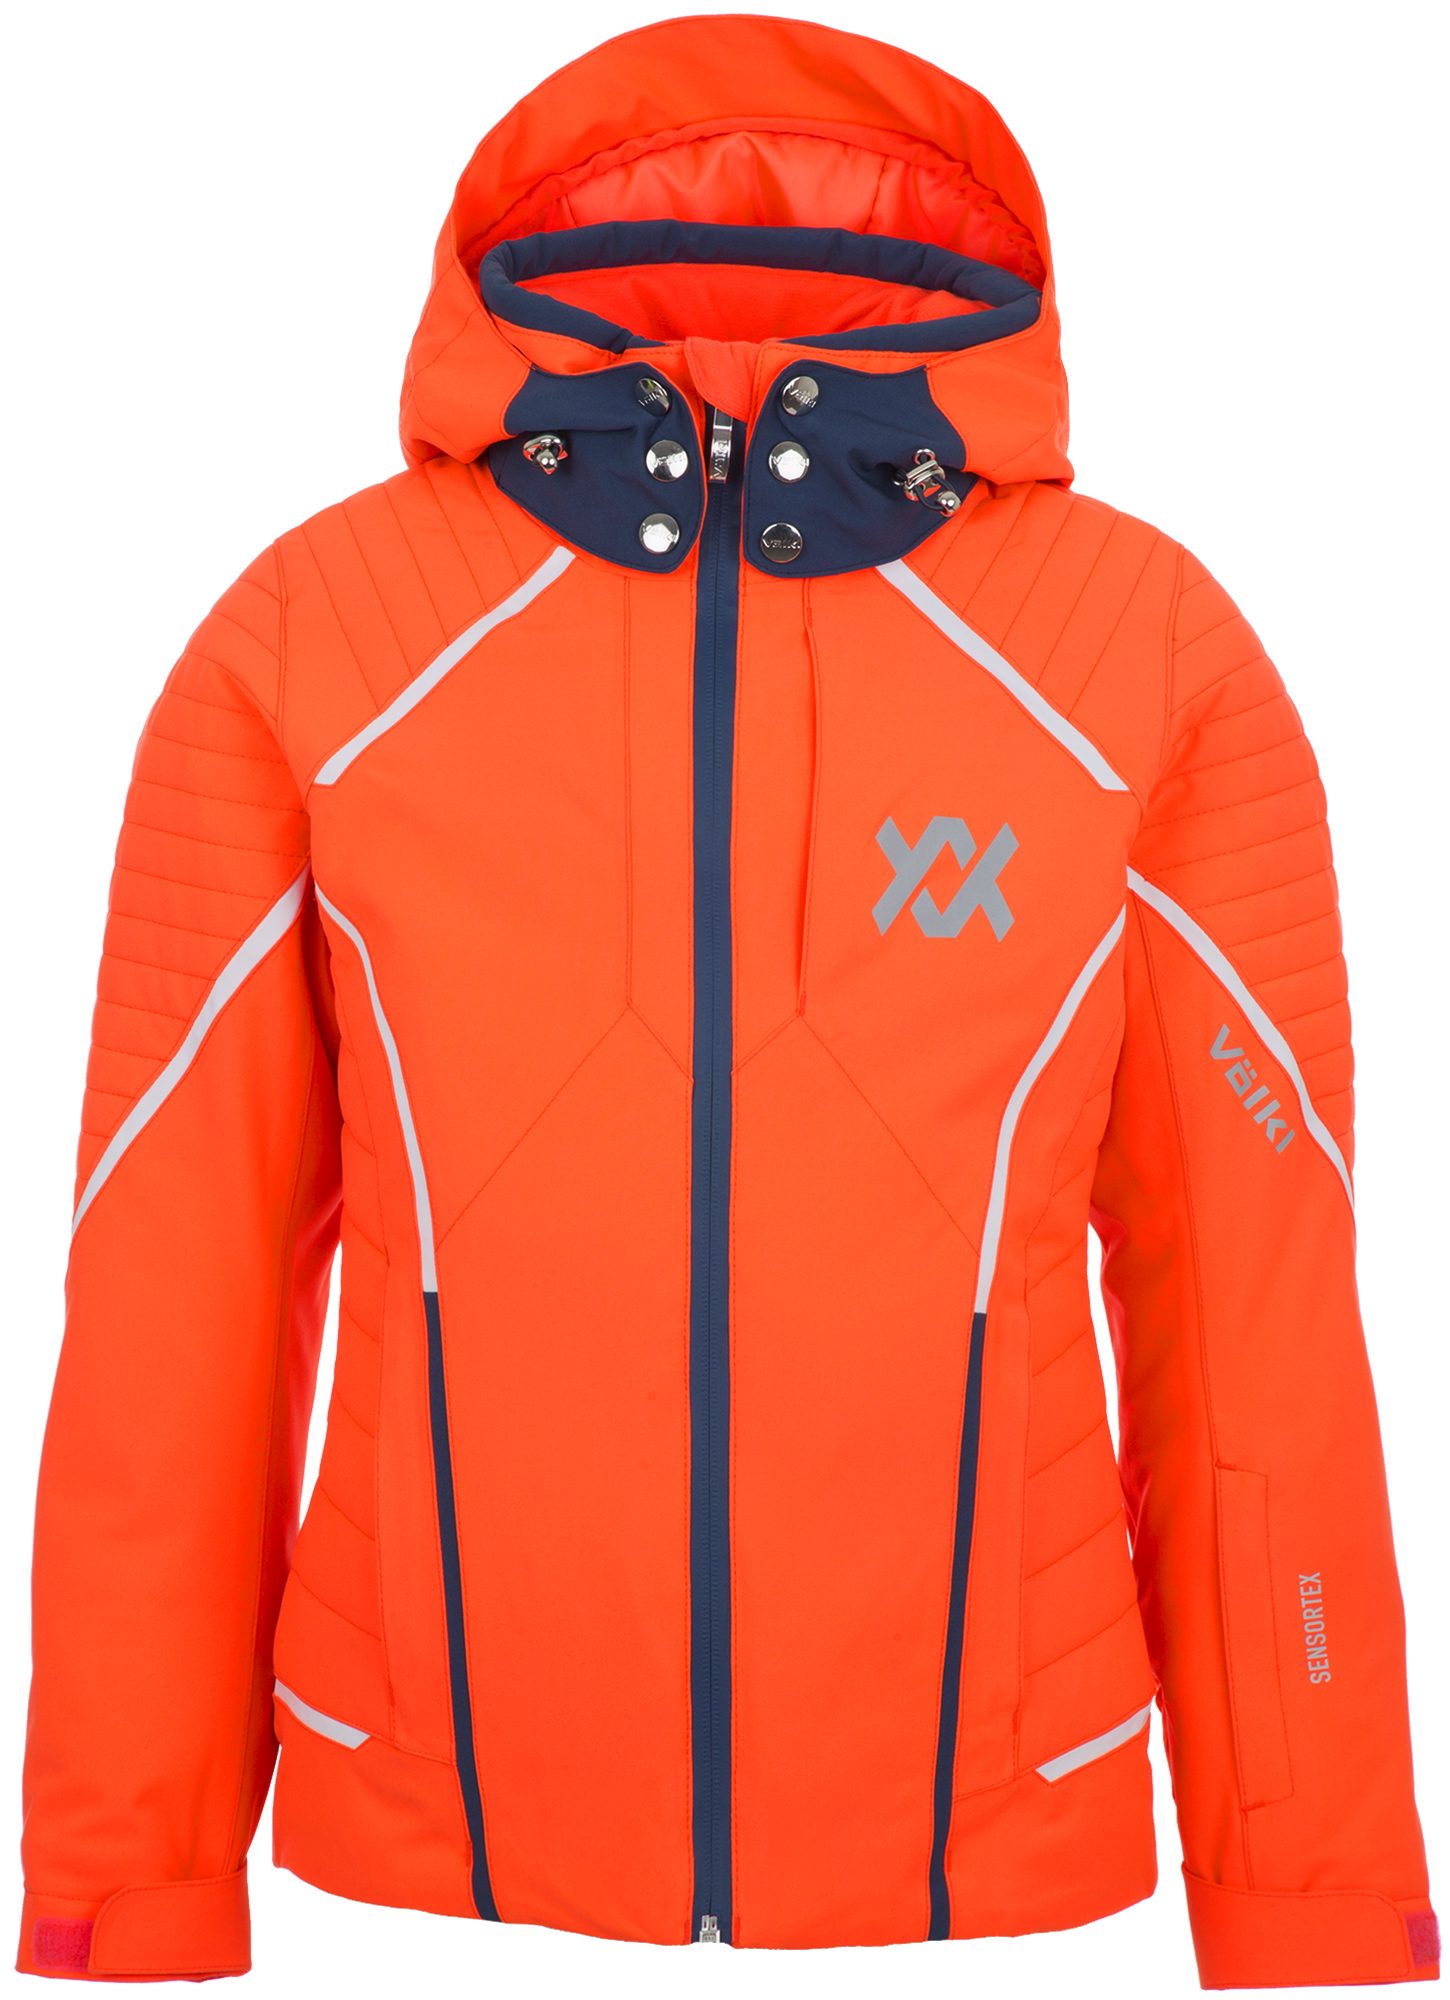 Volkl Куртка утепленная для девочек Volkl, размер 146 volkl volkl kanjo 18 19 размер 175